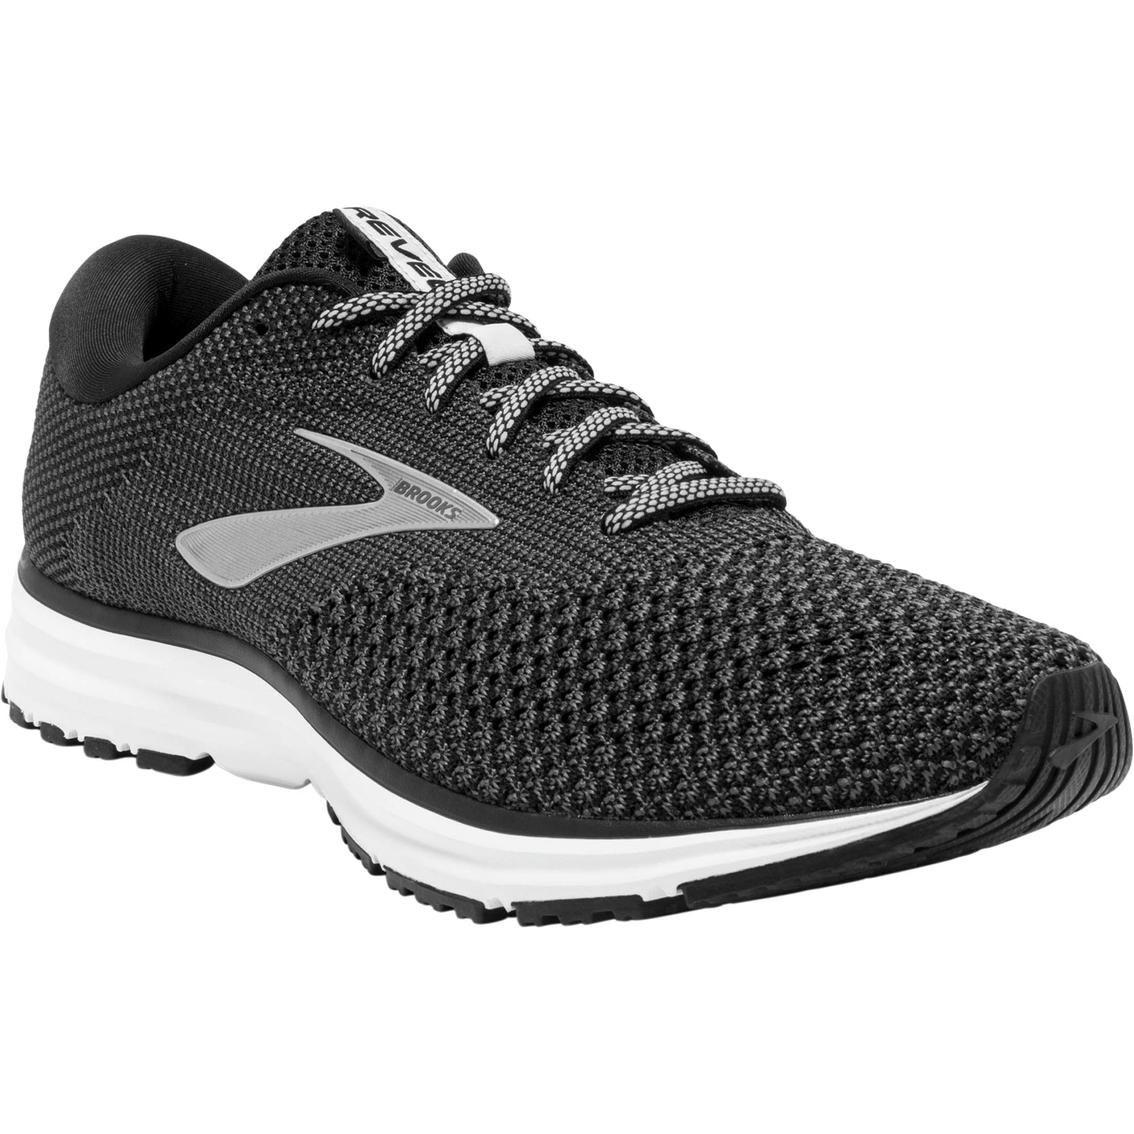 ae54af79a42e9 Brooks Men s Revel 2 Running Shoes